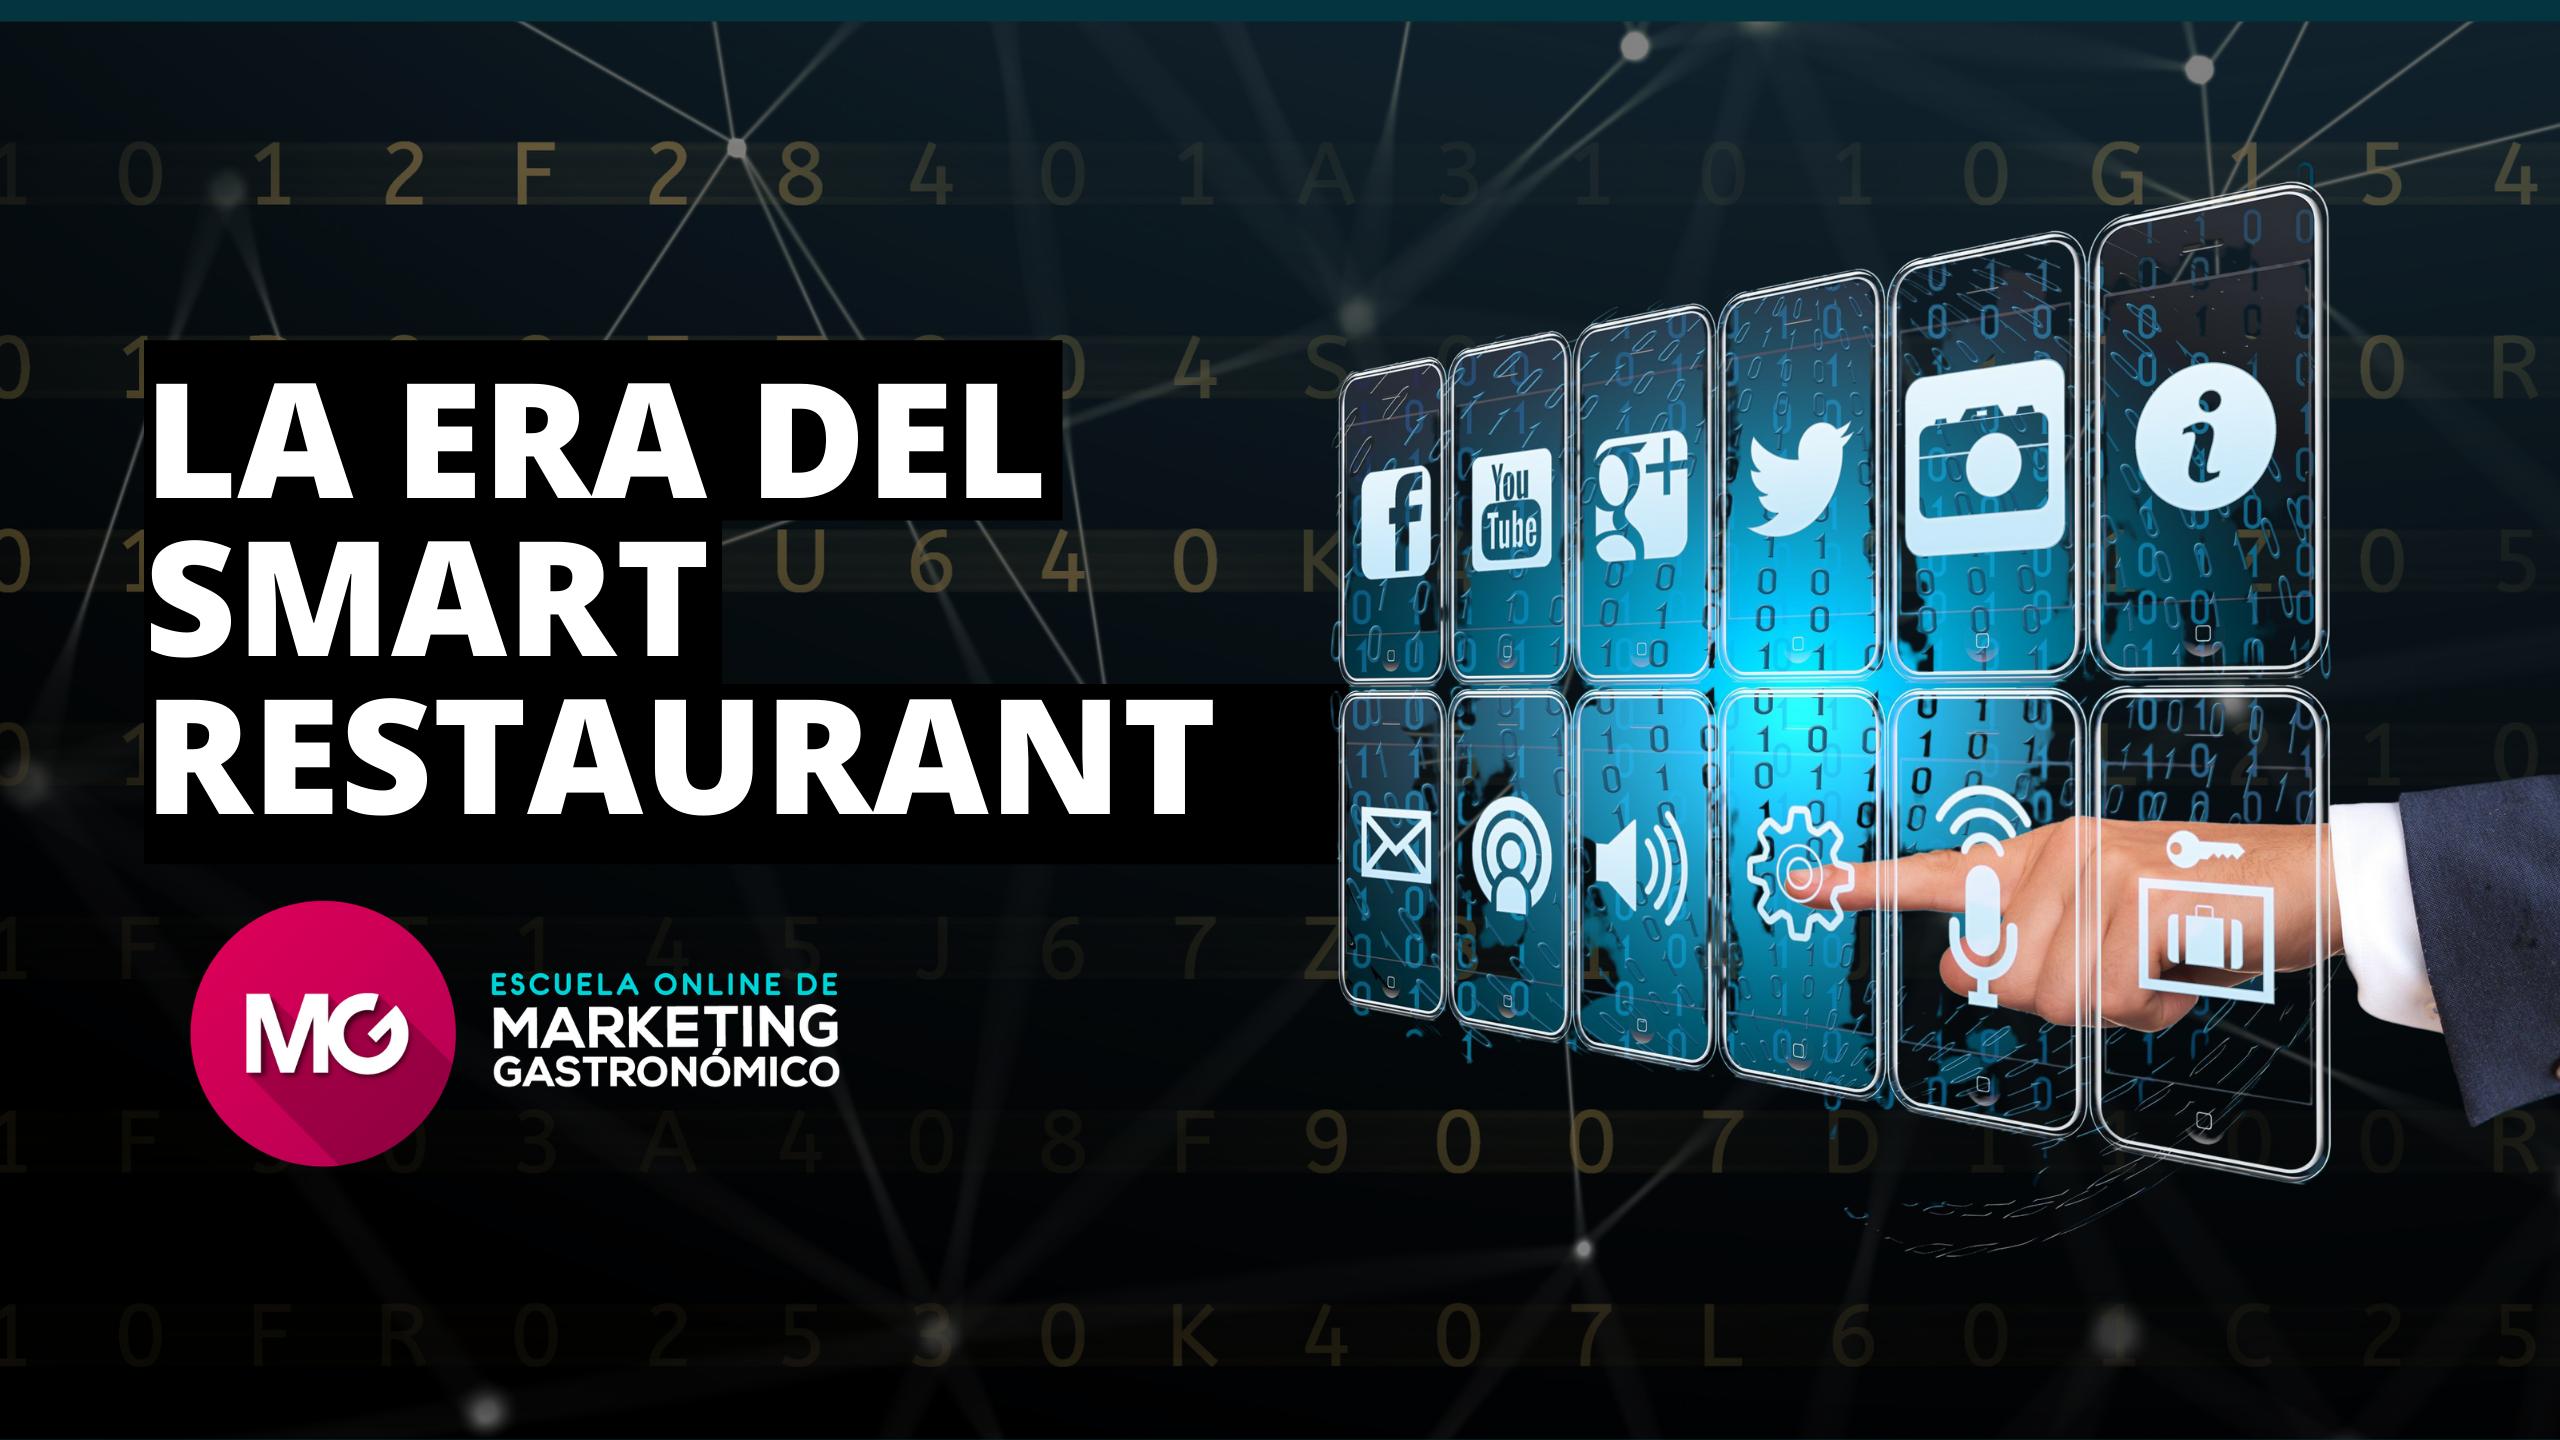 taller online de marketing gastronomico smart restaurant